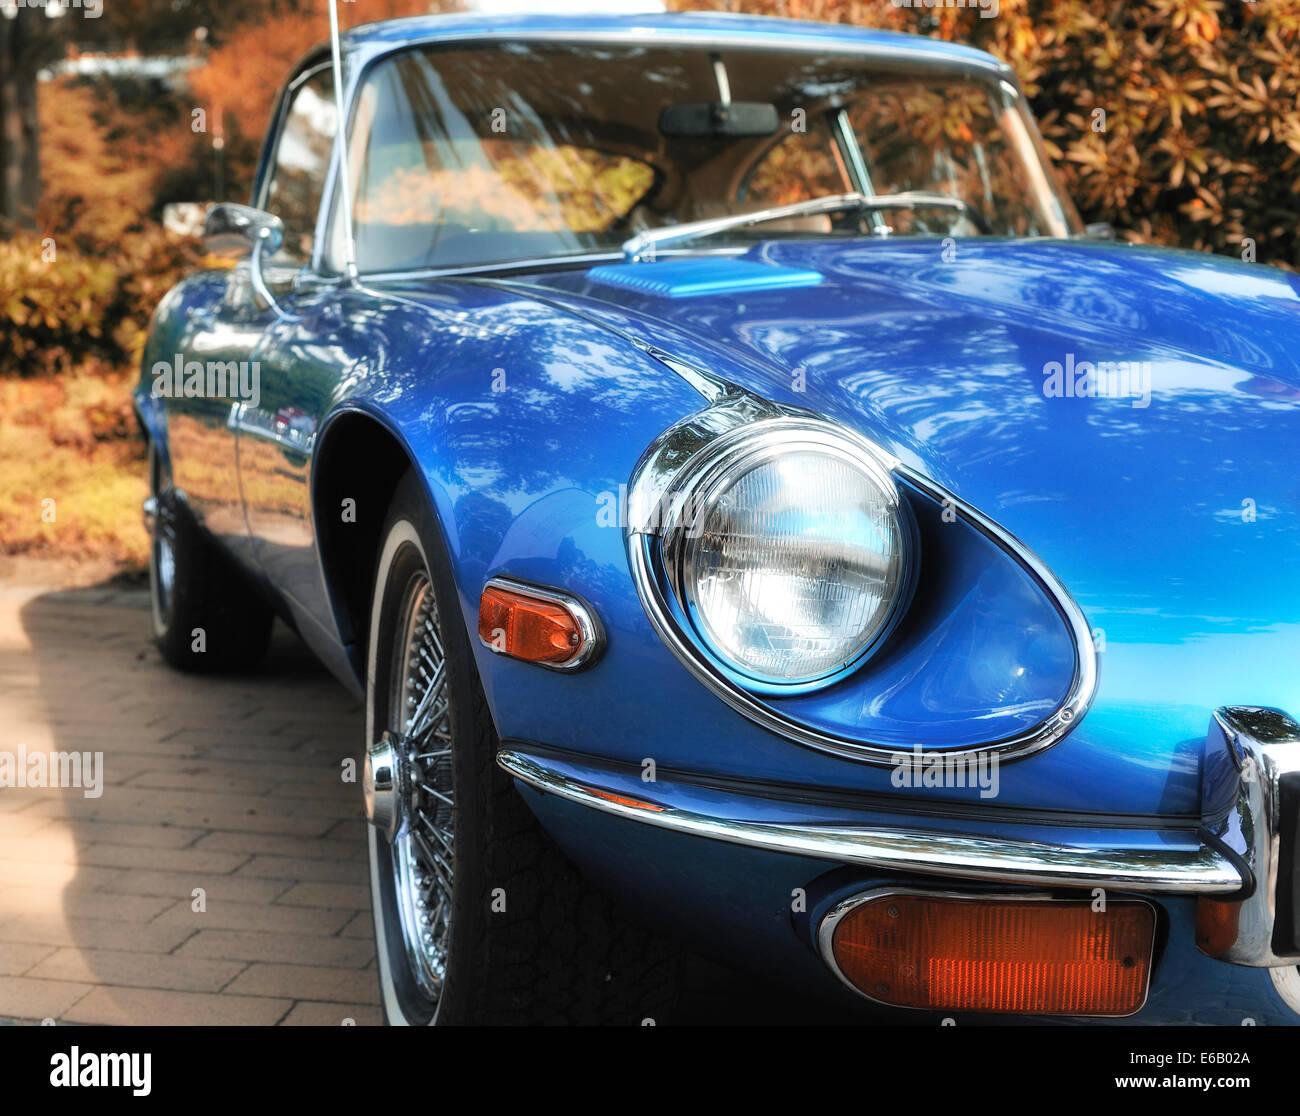 oldtimer,sports car - Stock Image